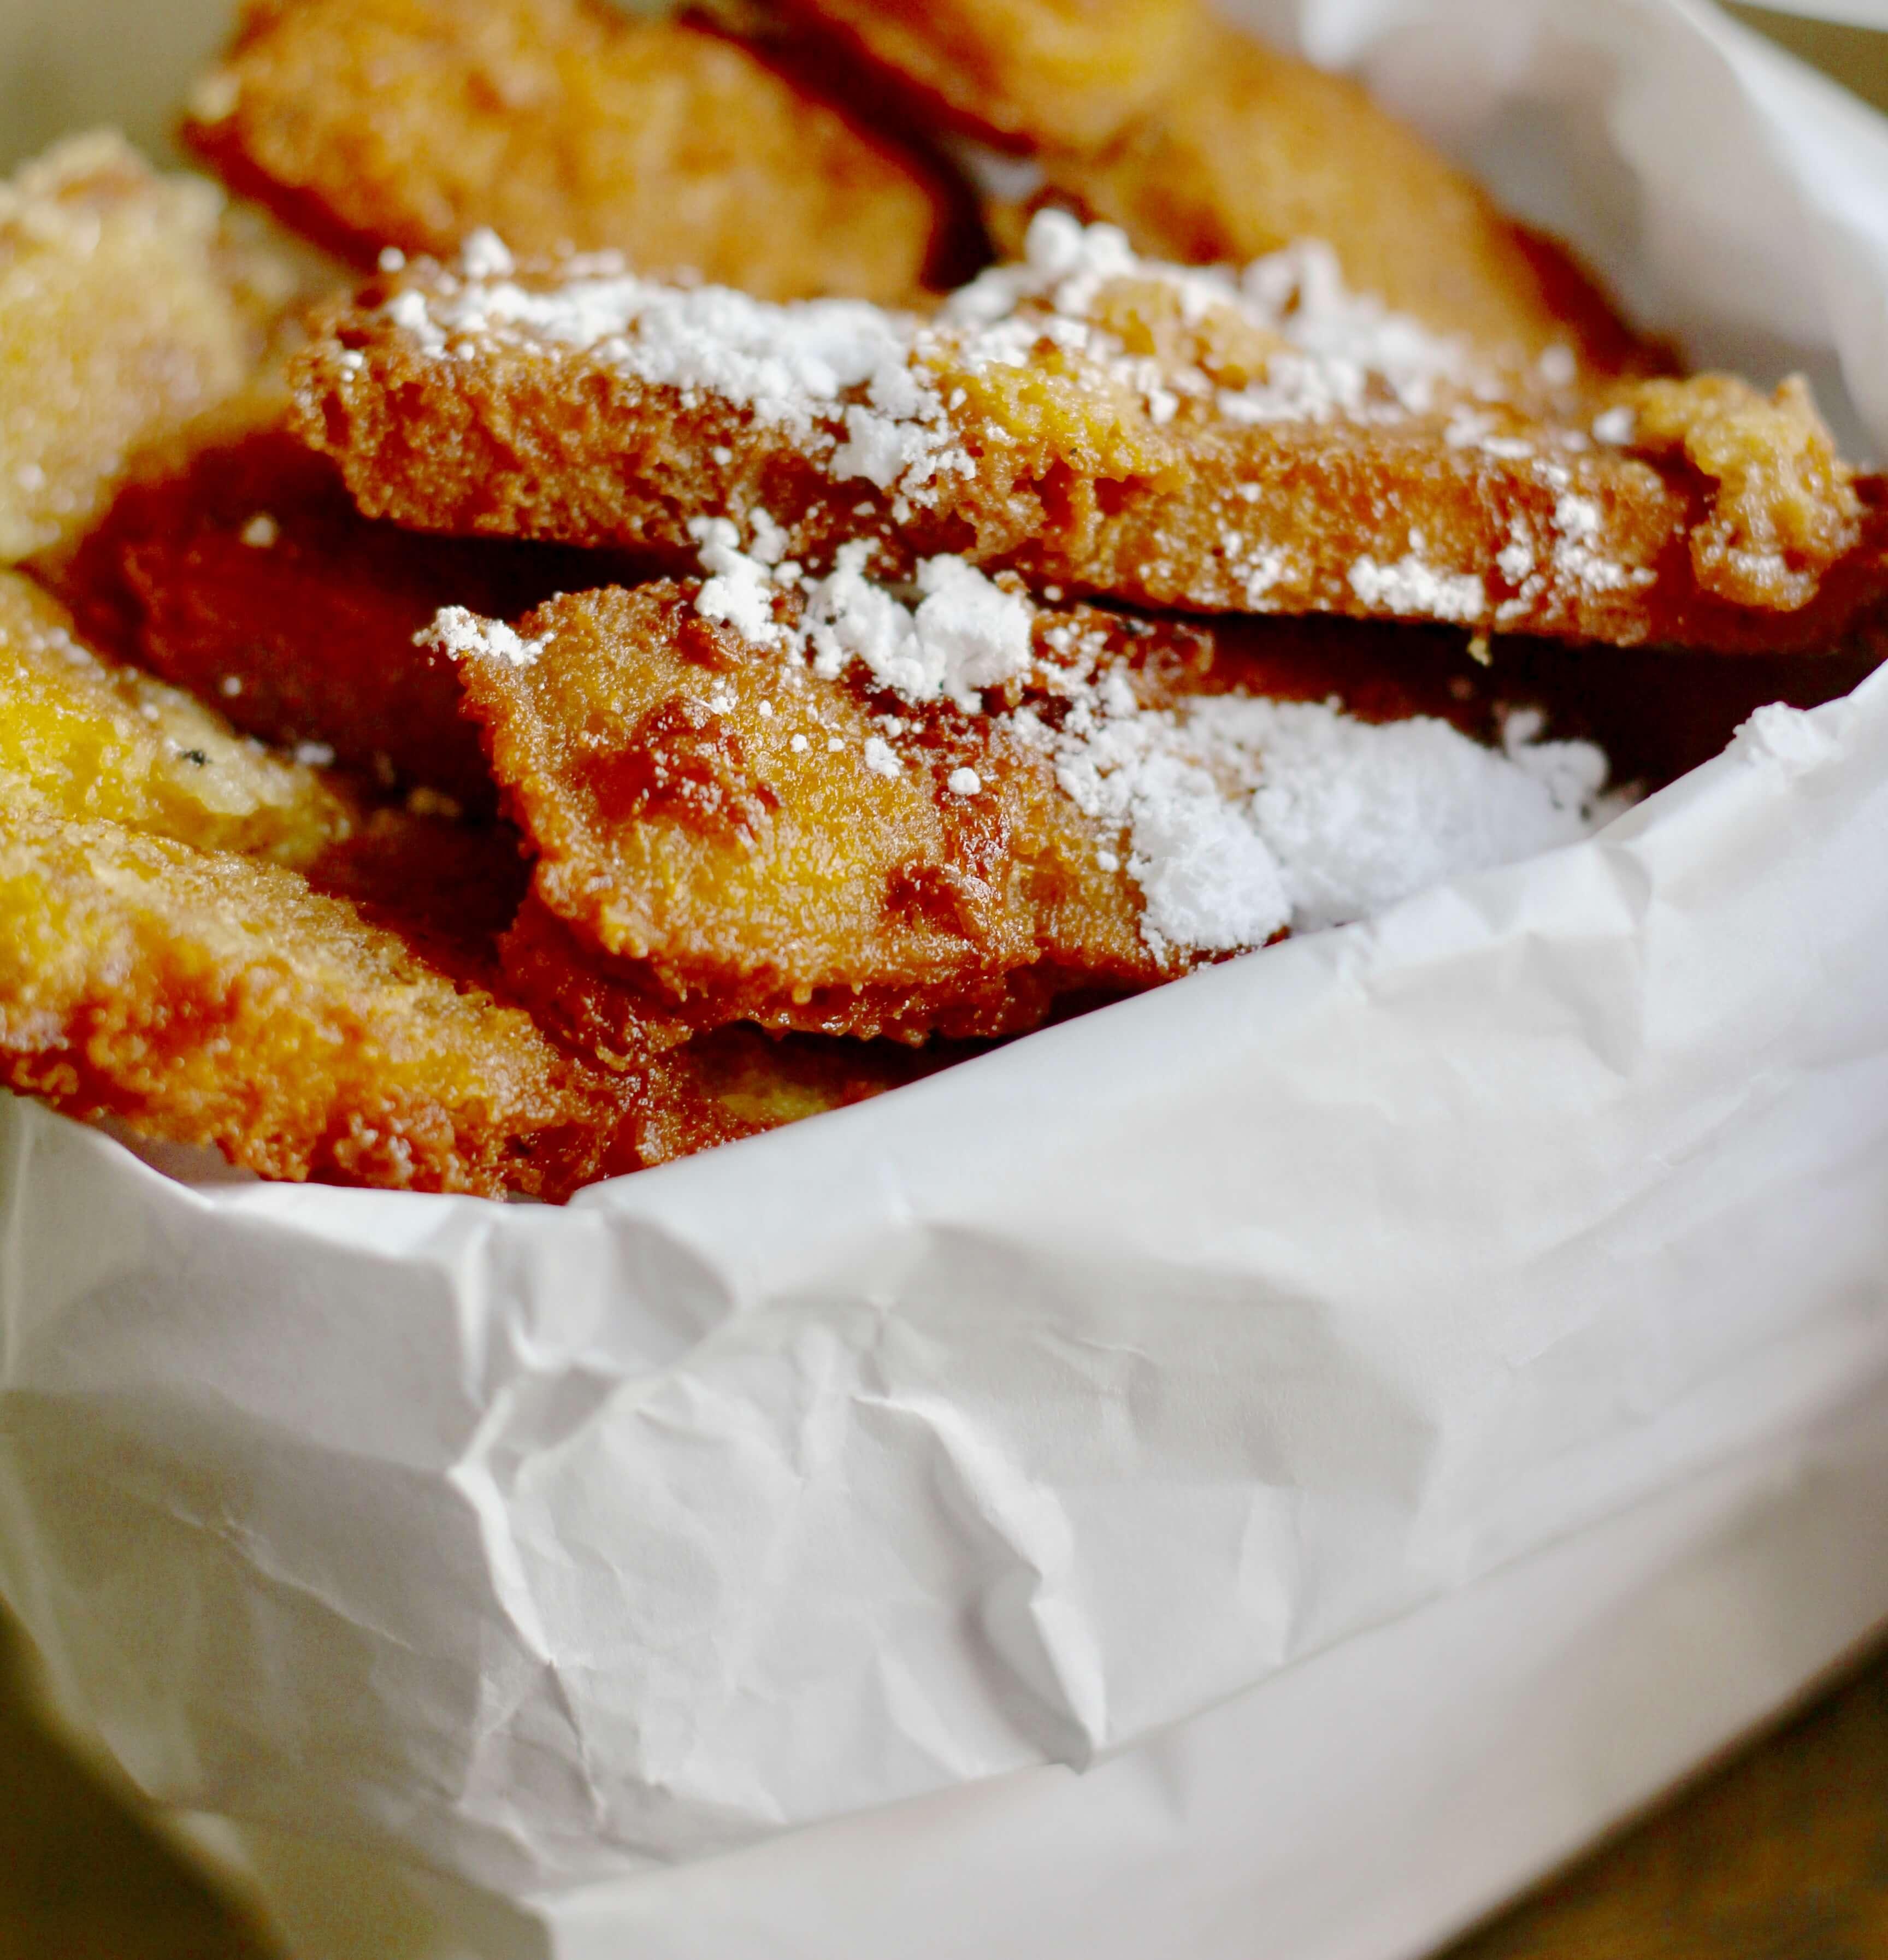 Recipe, Eggo Churro, Eggo, Churro, Food, Everyday Party Magazine